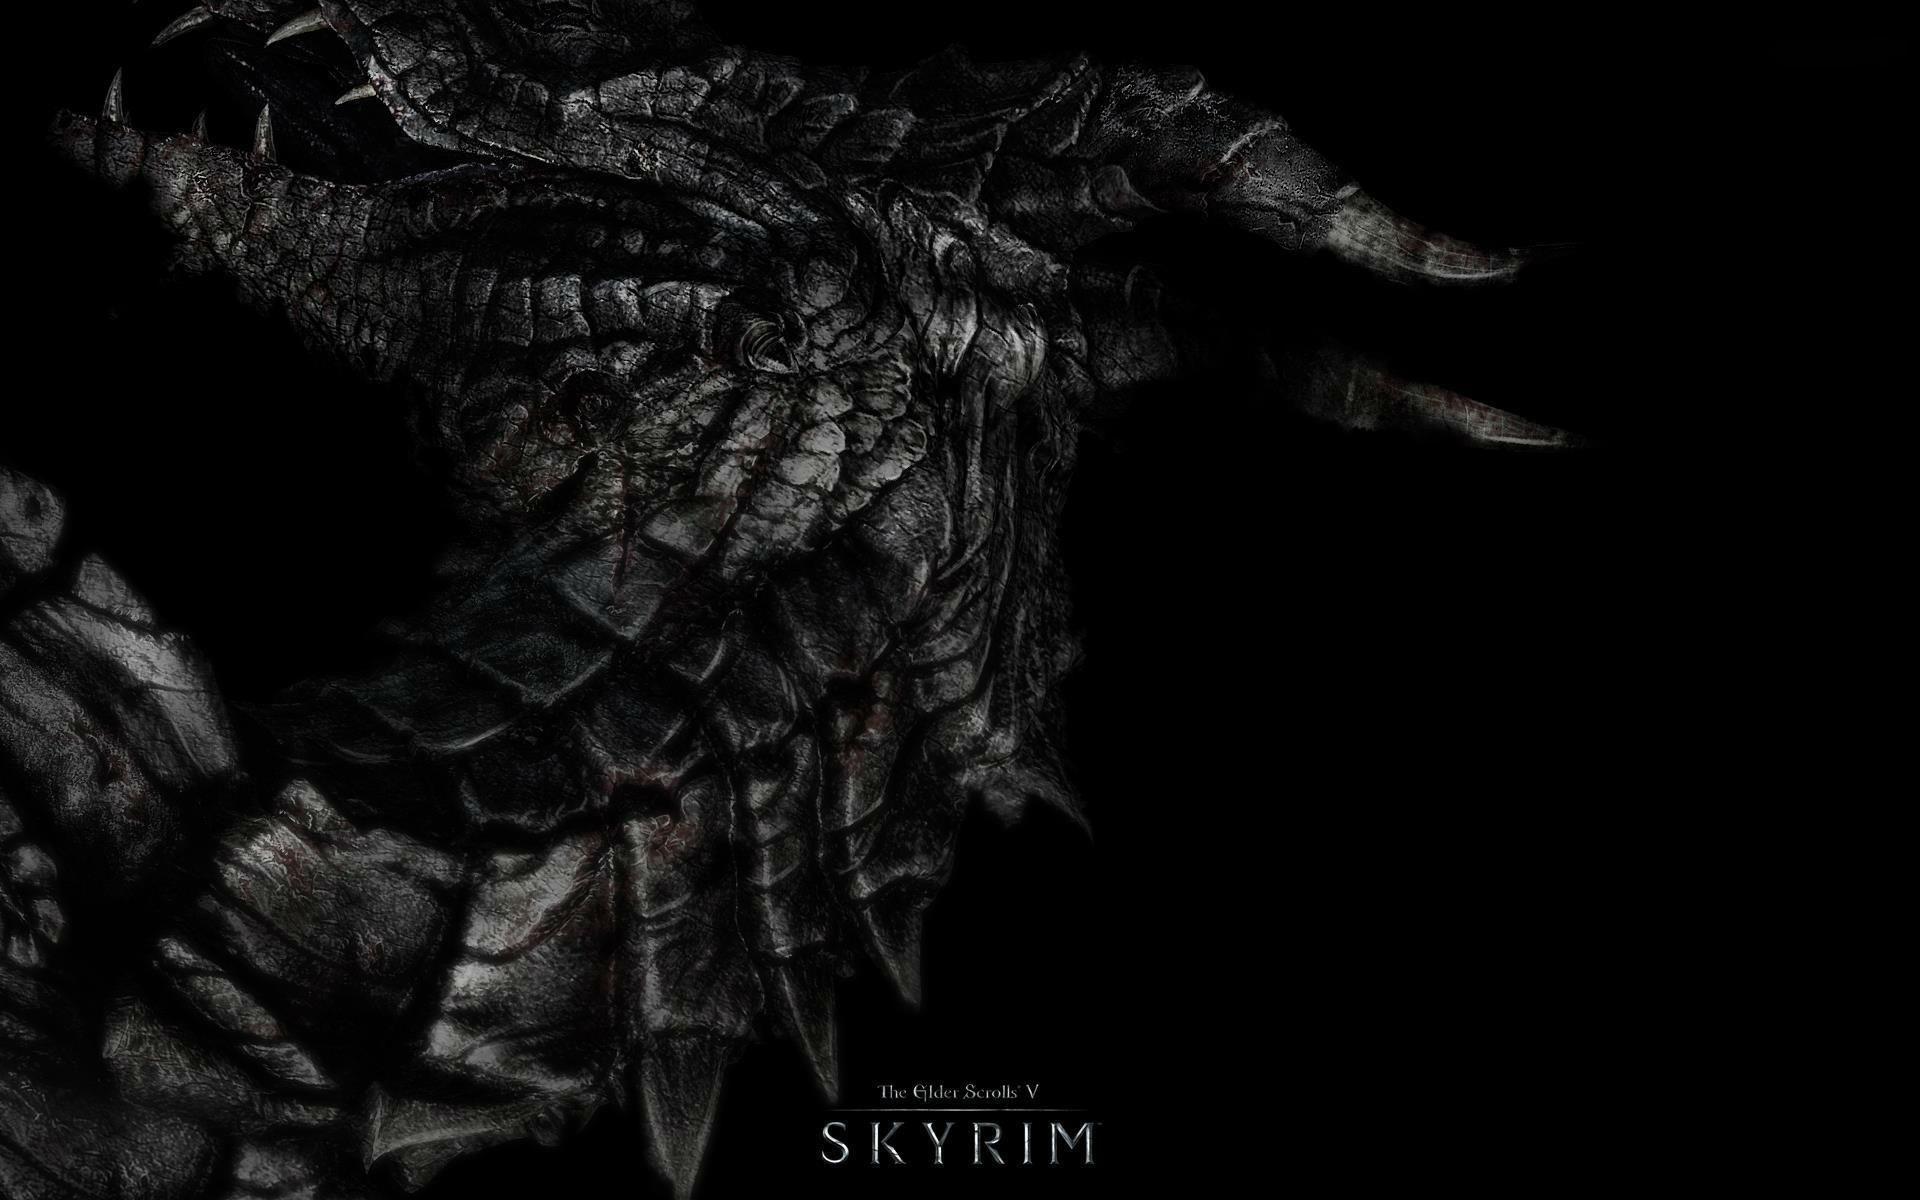 Free skyrim wallpaper background